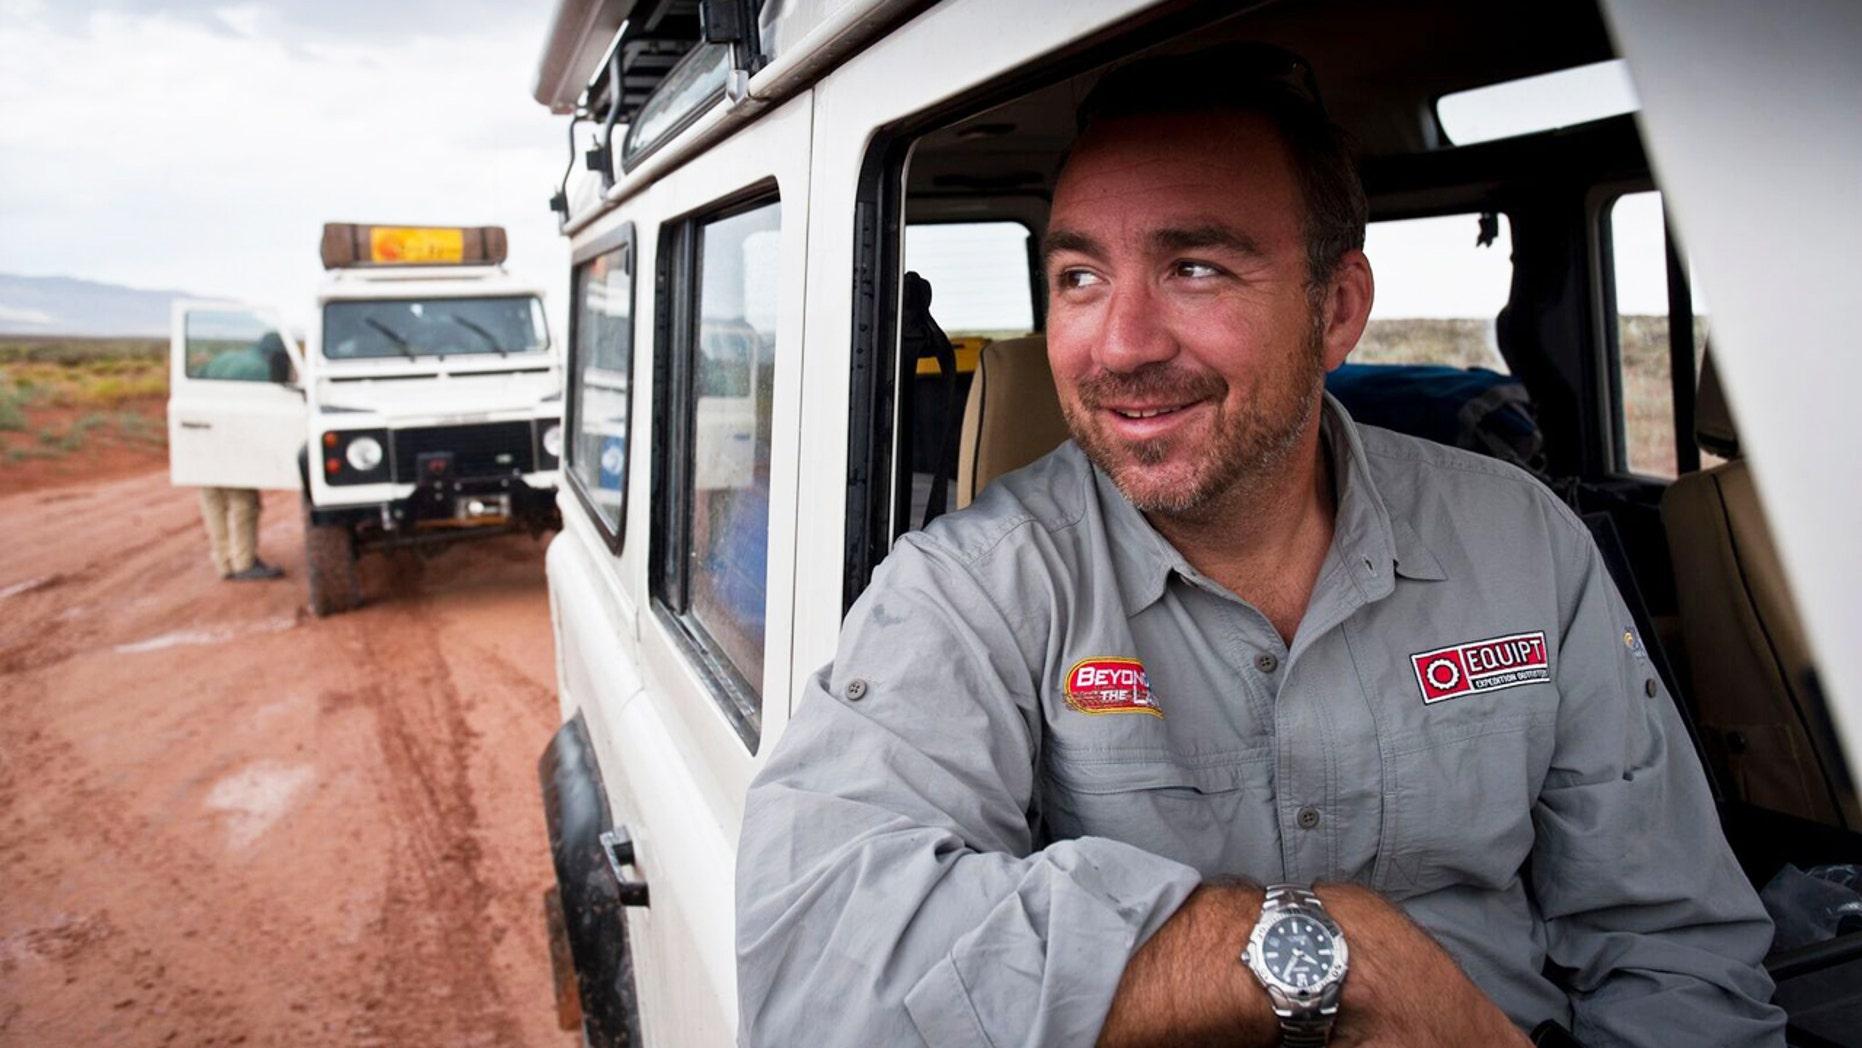 Red Oxx founder Jim Markel.